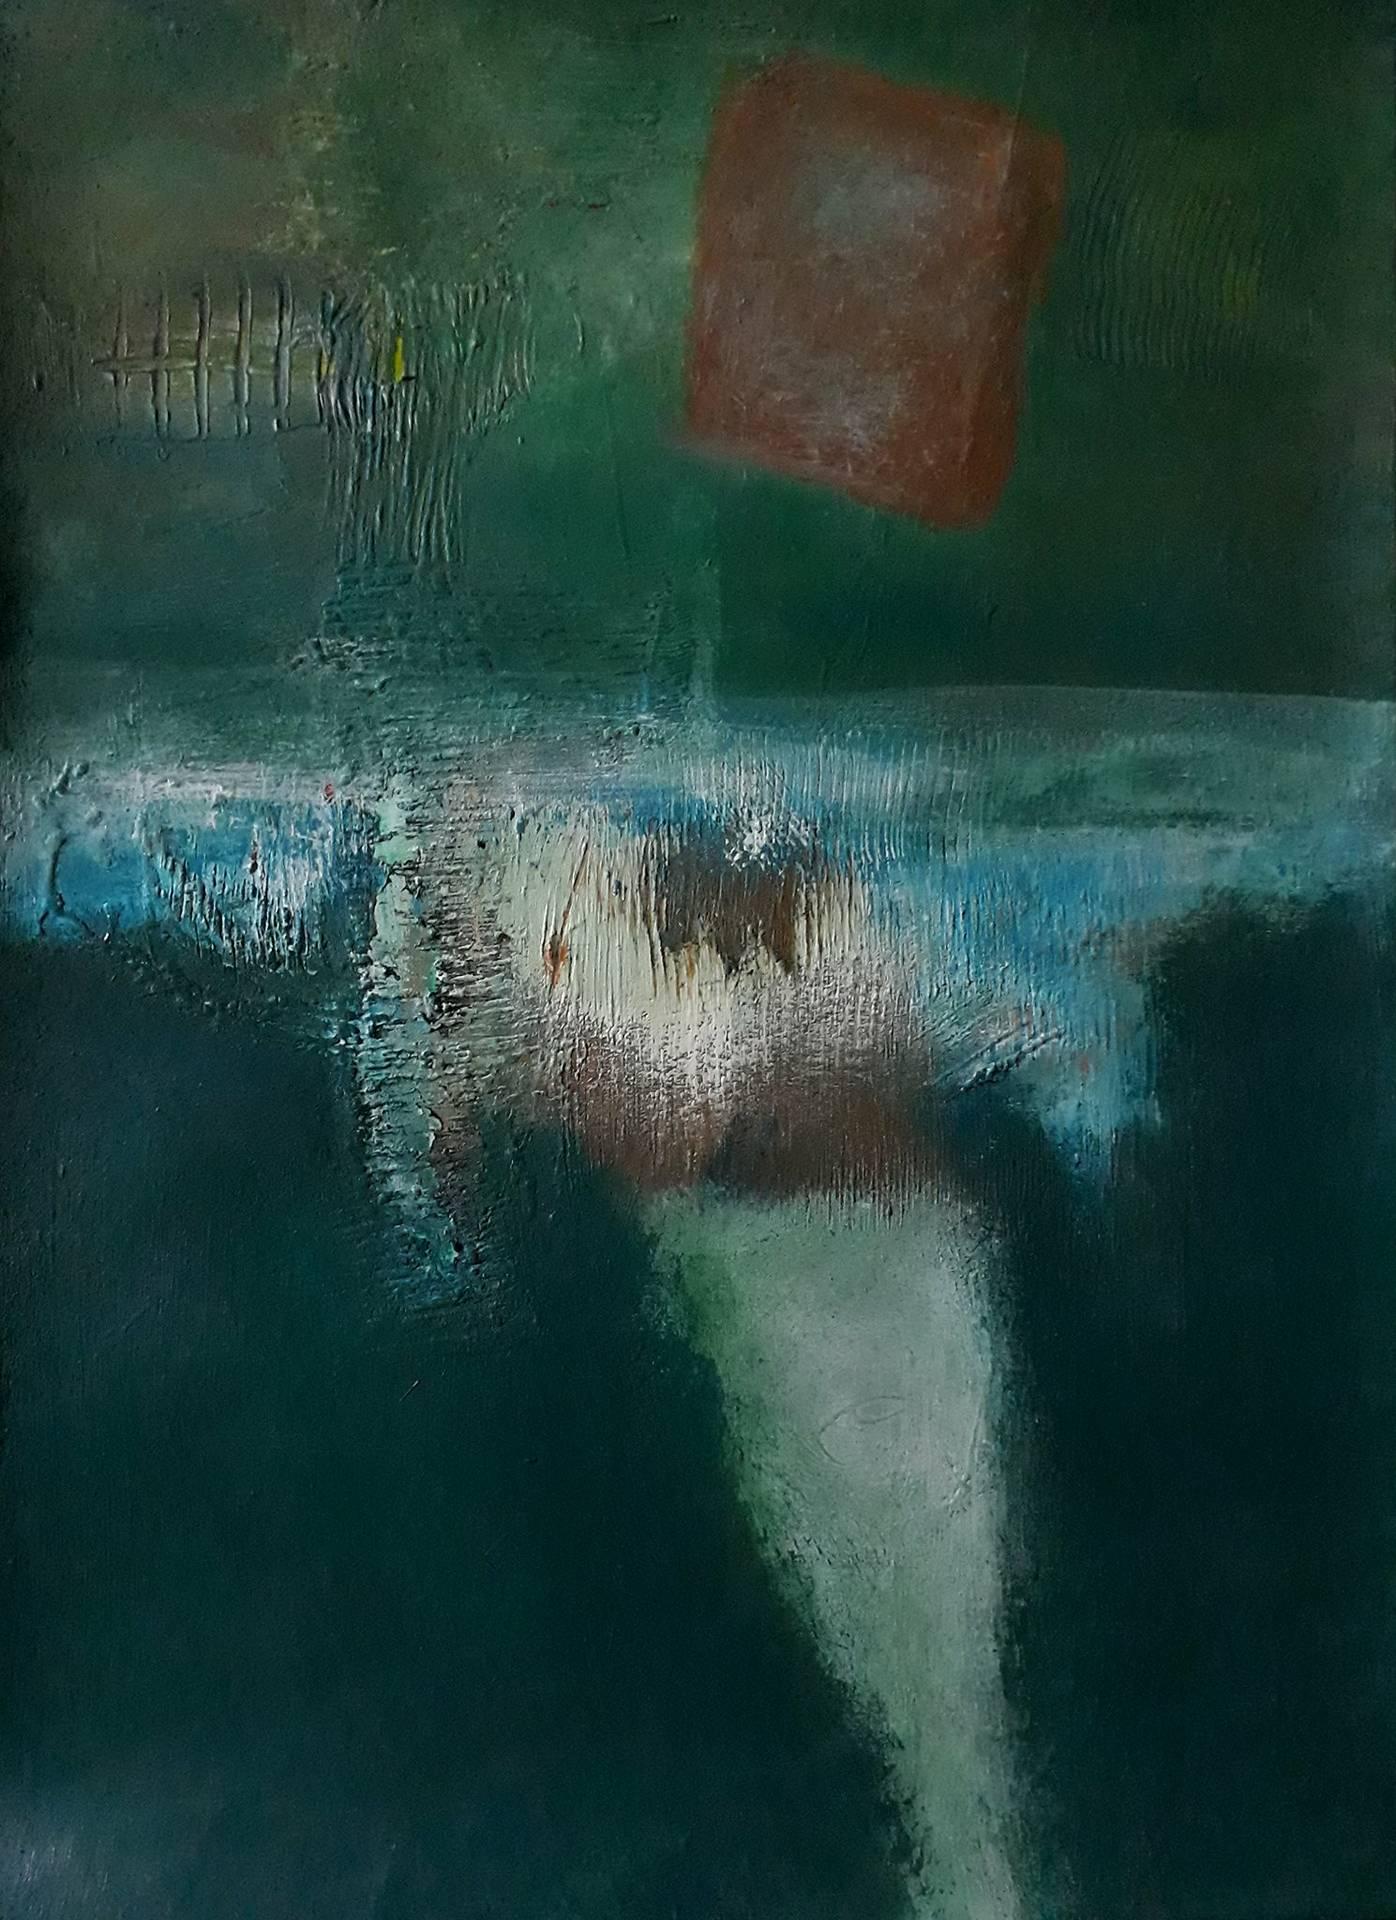 Elegy, dipinto di Somnath Basuthakur